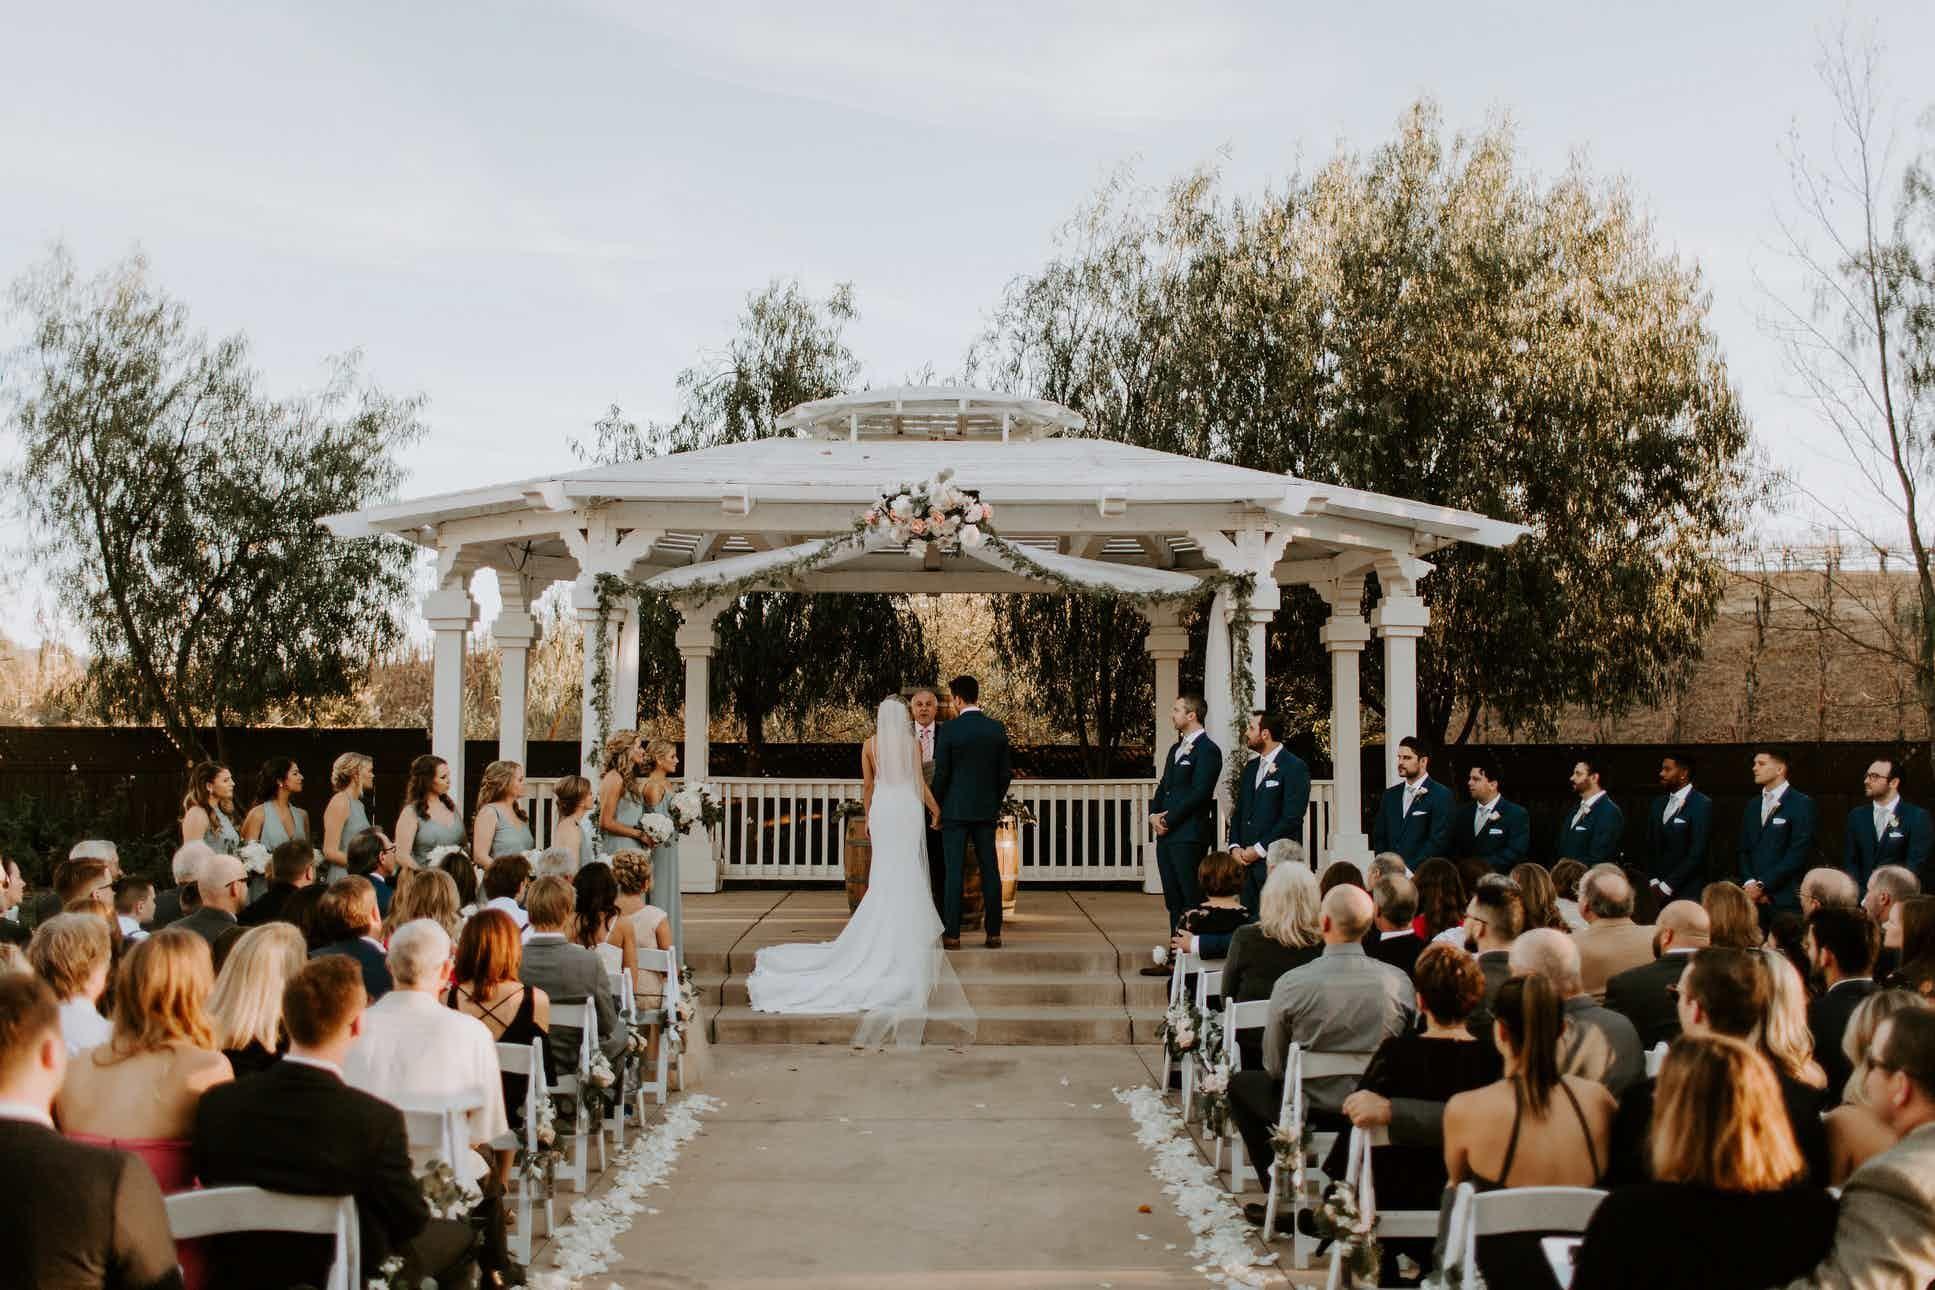 Wilson Creek Winery Wedding Venue Temecula Ca 92591 Winery Wedding Venue Winery Weddings Wedding Reception Southern California